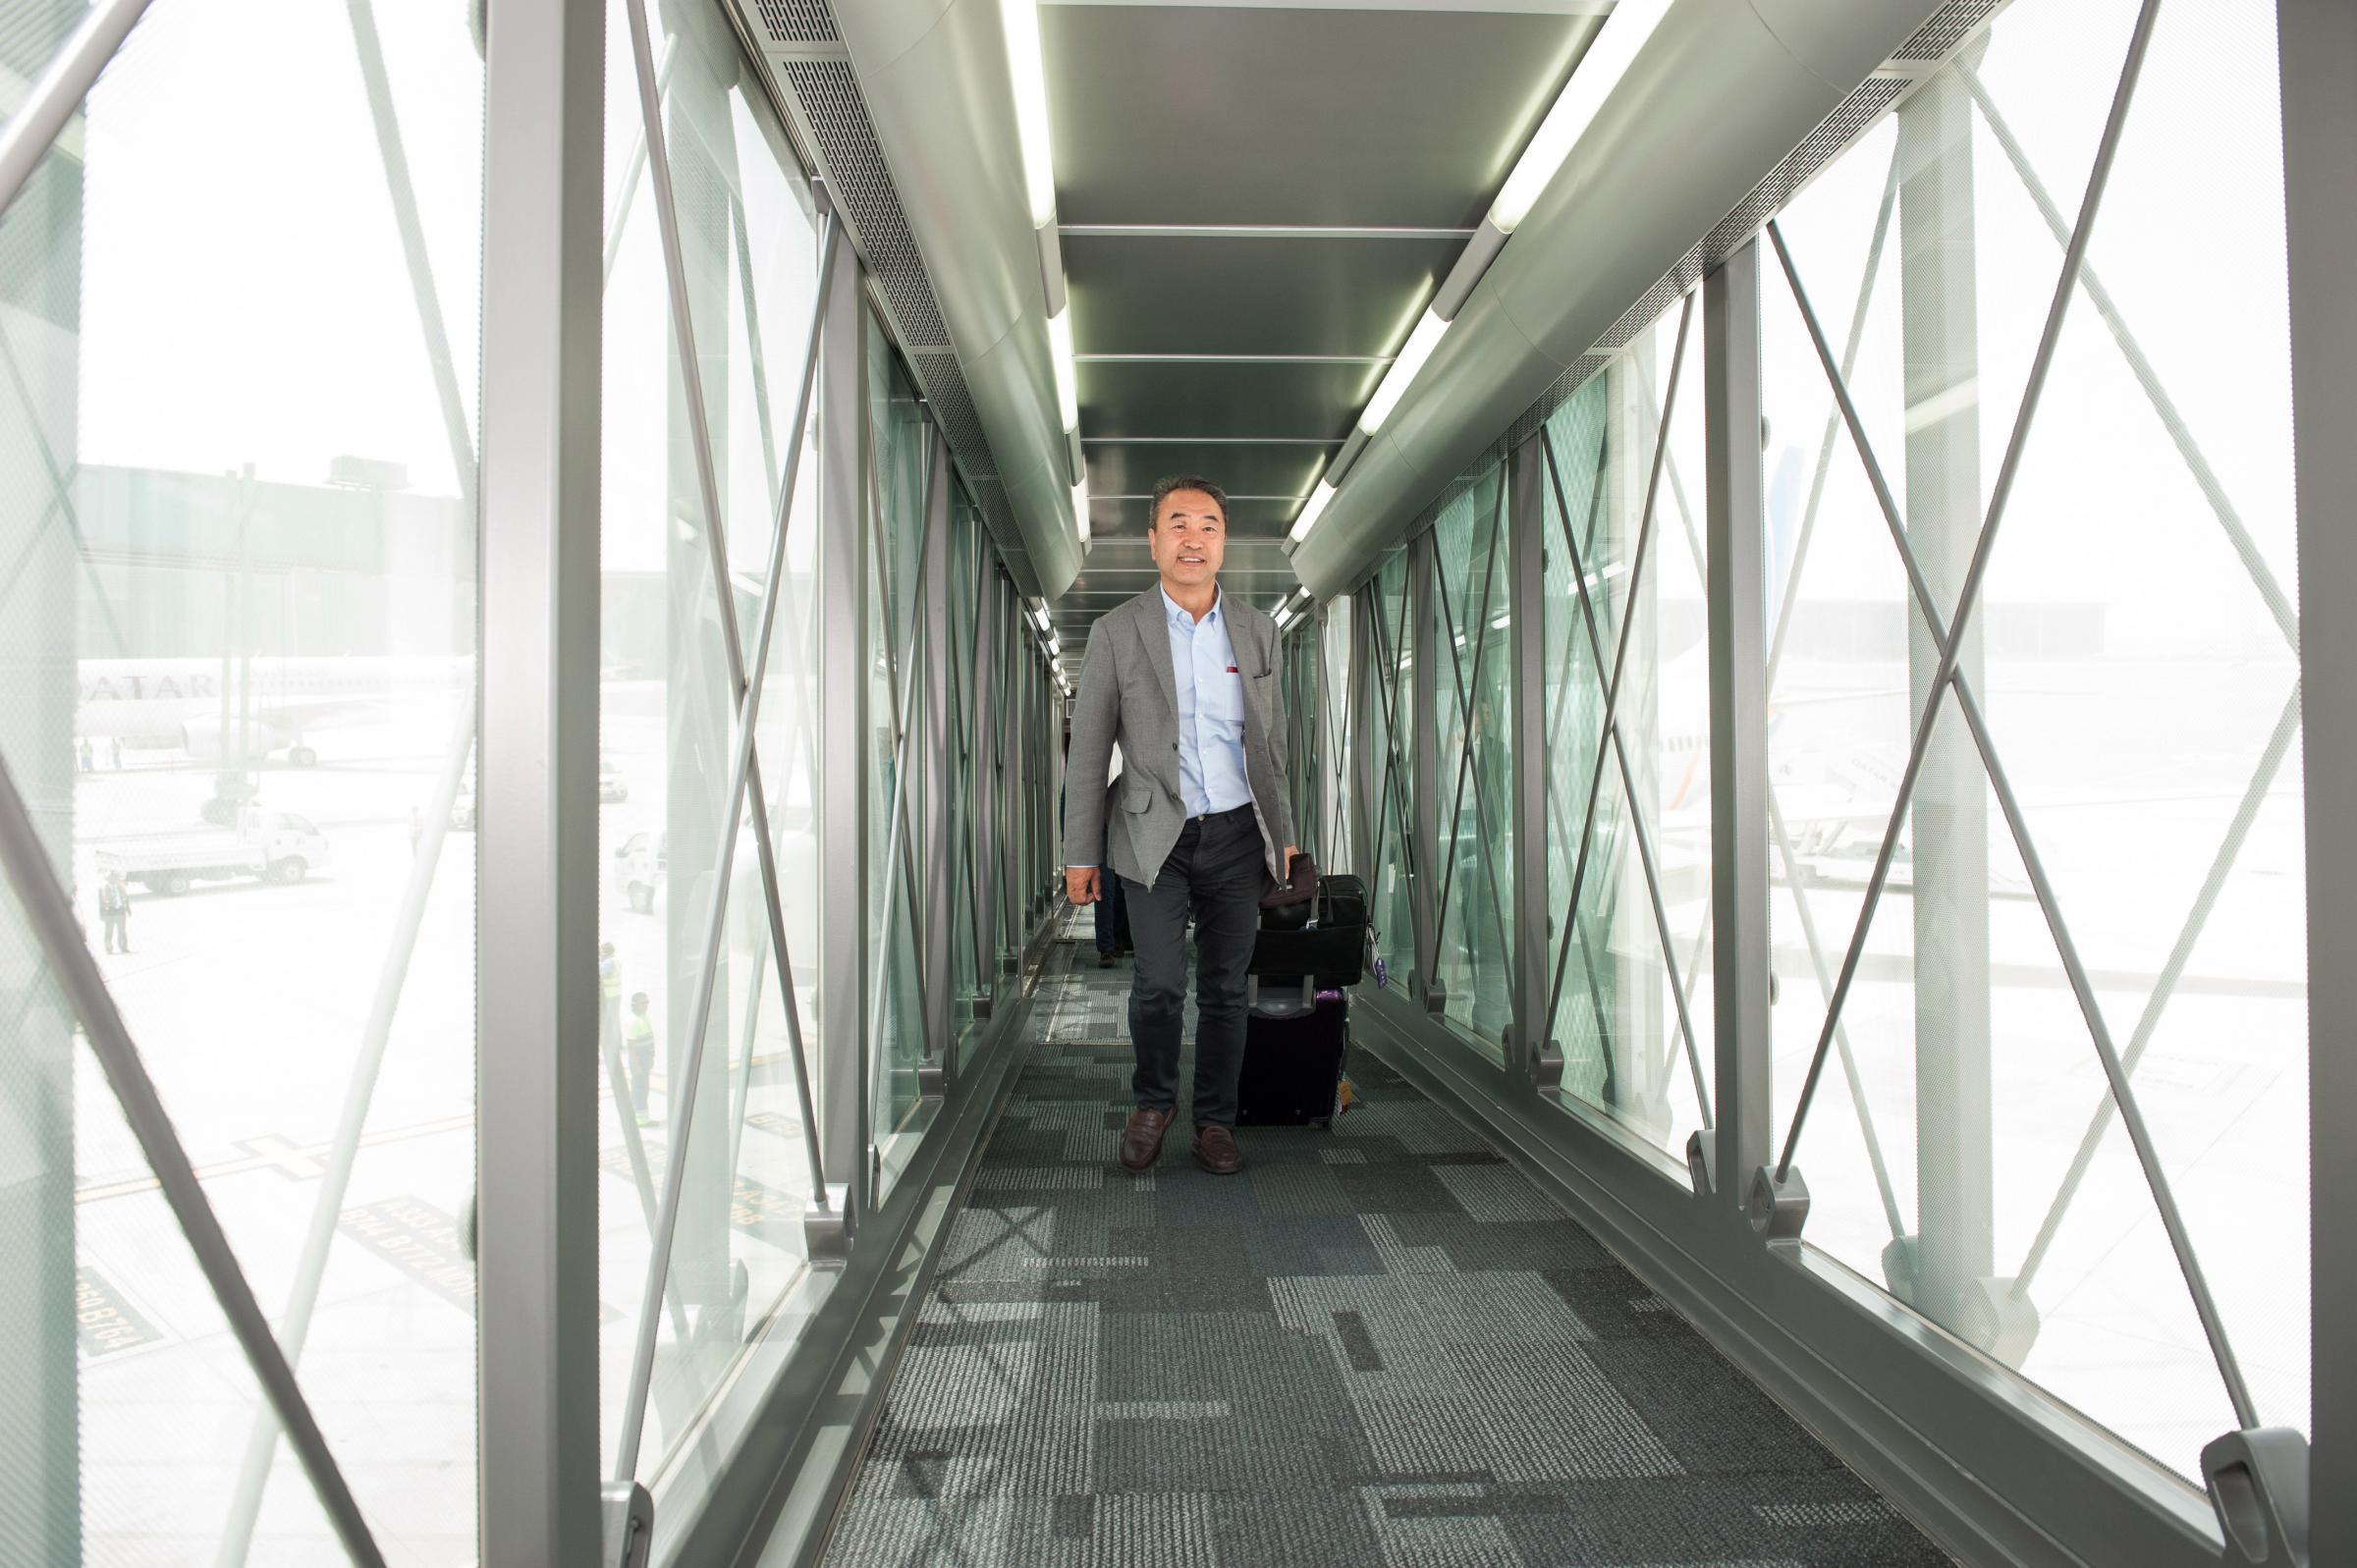 Aeroporto Hamad : Fontane d acqua e chaise longue inaugurato a doha il